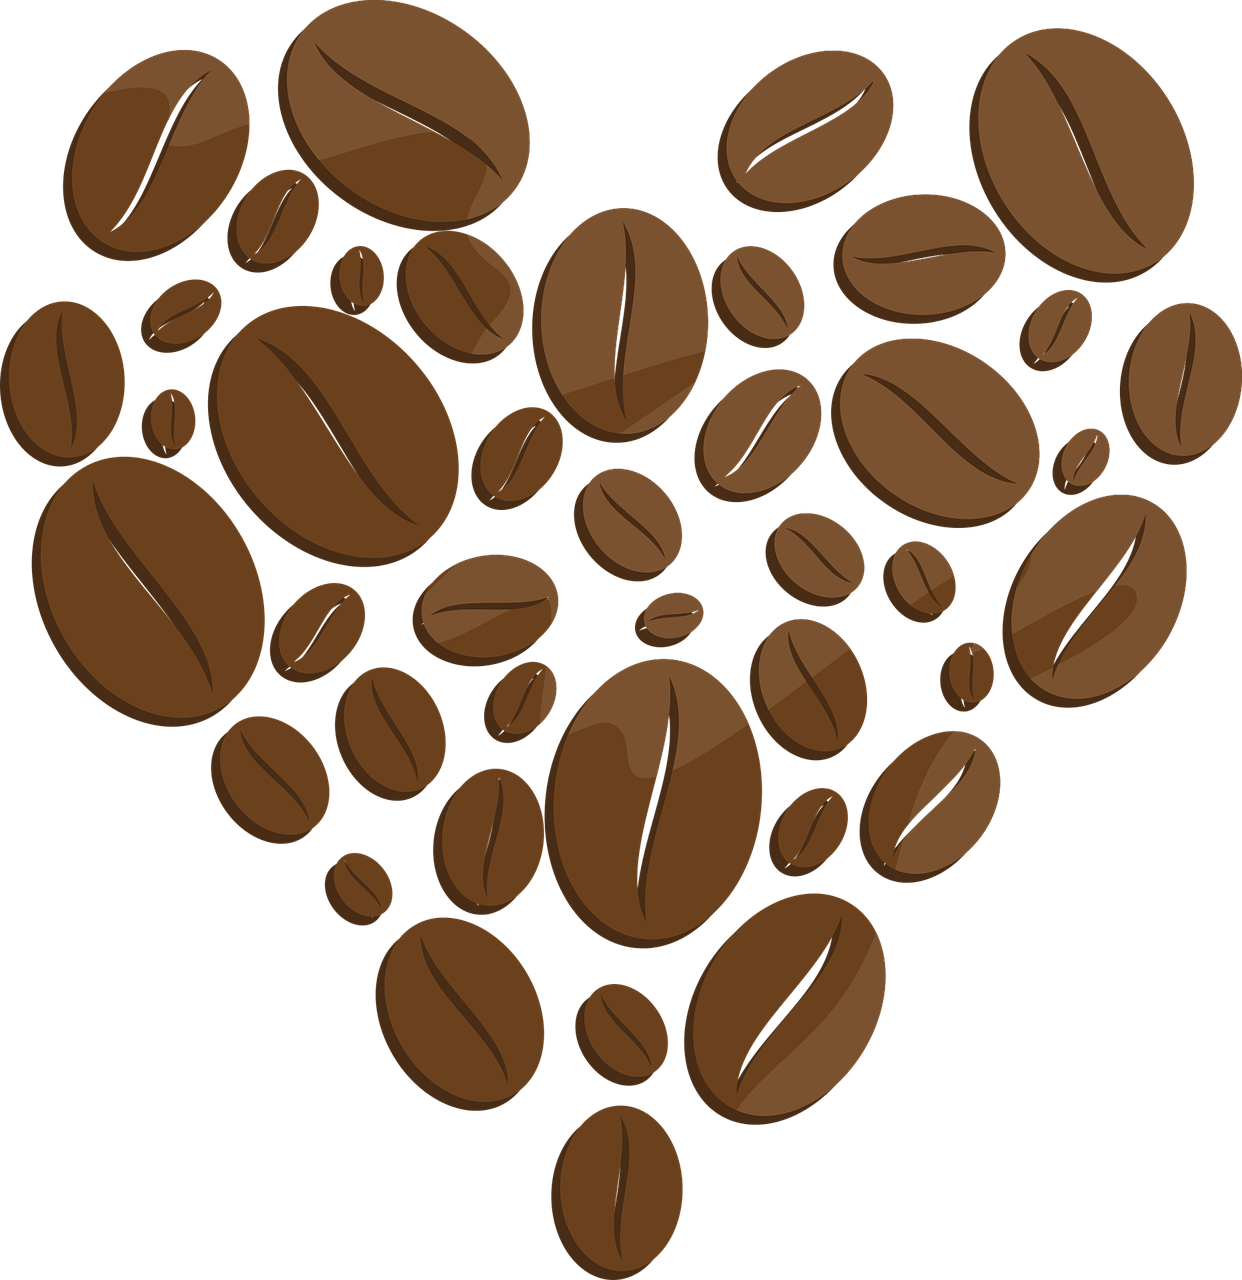 Coffee Coffee Coffe Beans Heart Drawing Coffee Coffee Coffe Beans Heart Drawing Beans Blended Coffee Coffee Lover